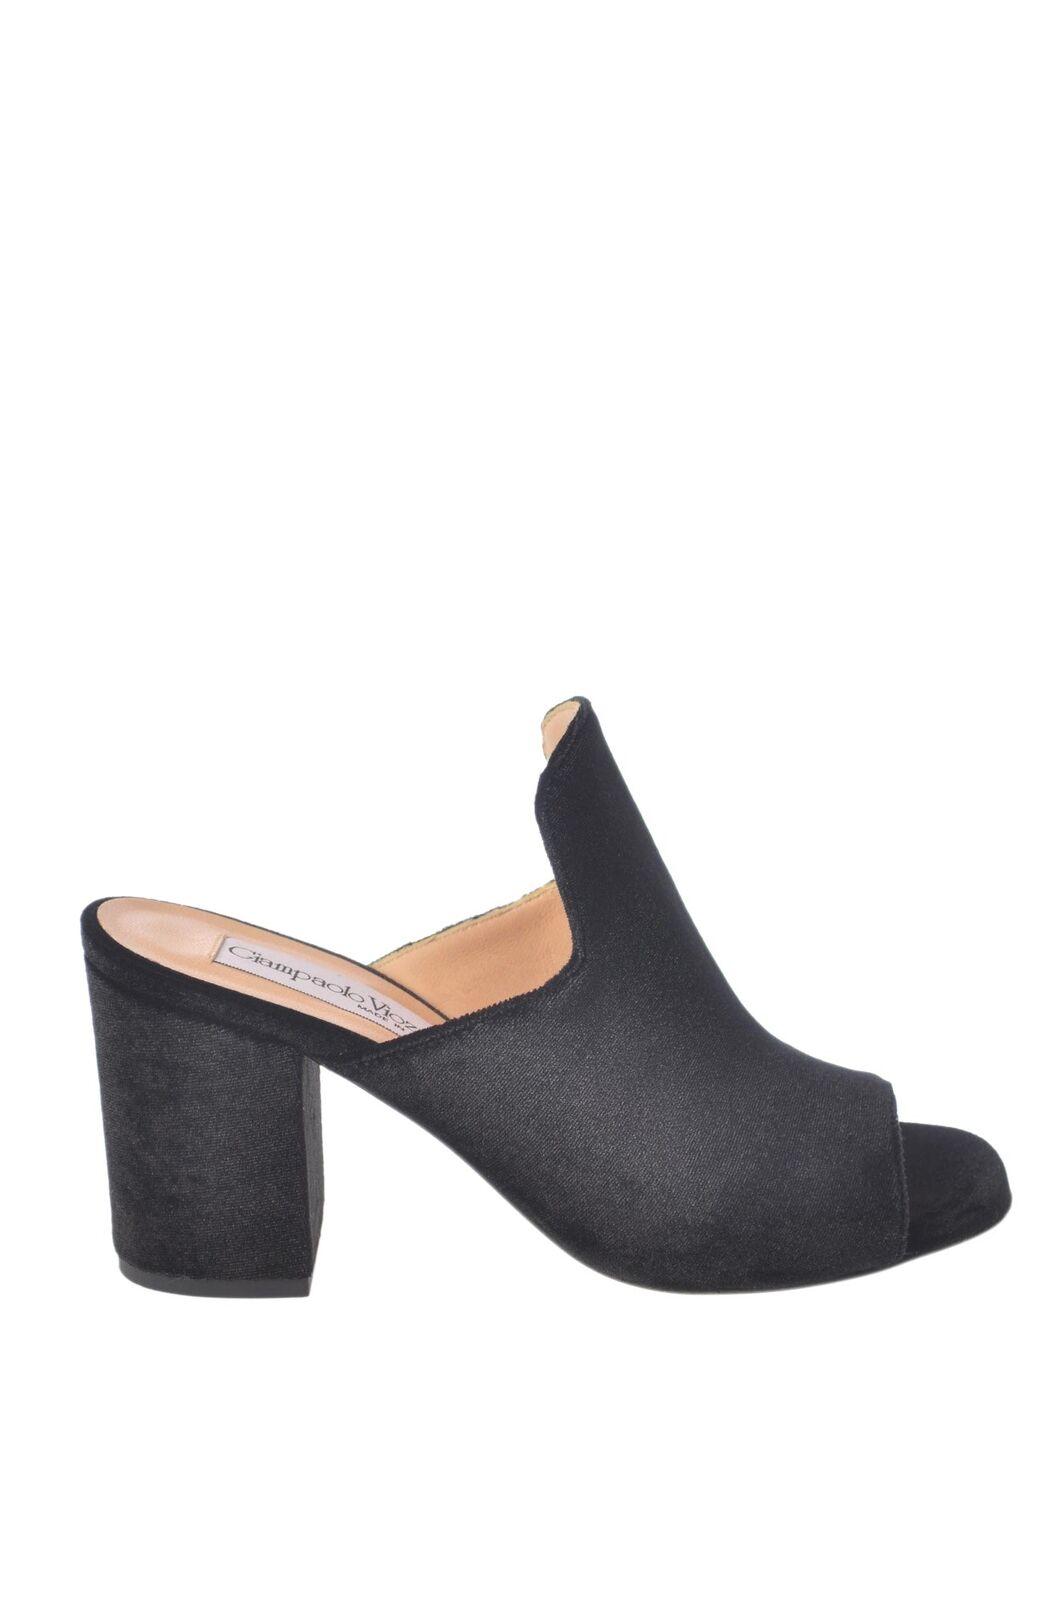 Le Viozzi - zapatos-zapatos - mujer - negro - - - 4376425E184423  respuestas rápidas